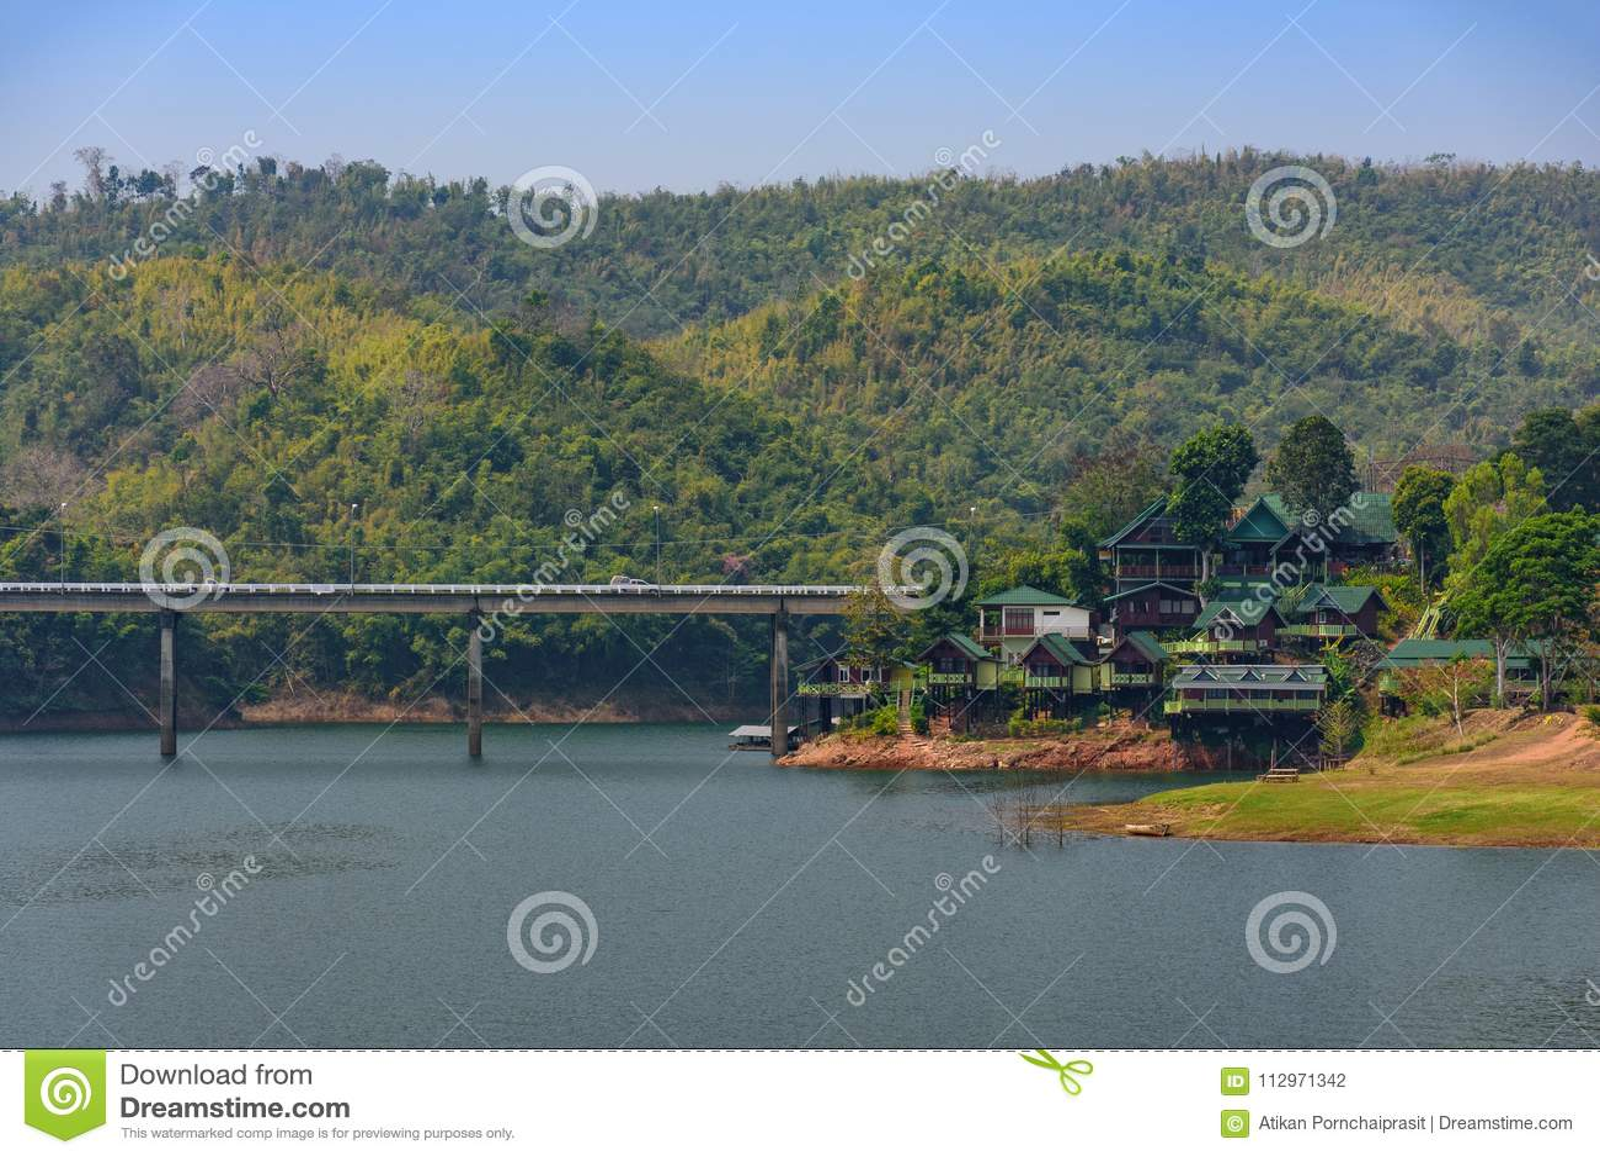 Kanchanaburi, Thailand - Februari 19, 2018: Grote die brug wordt gemaakt van